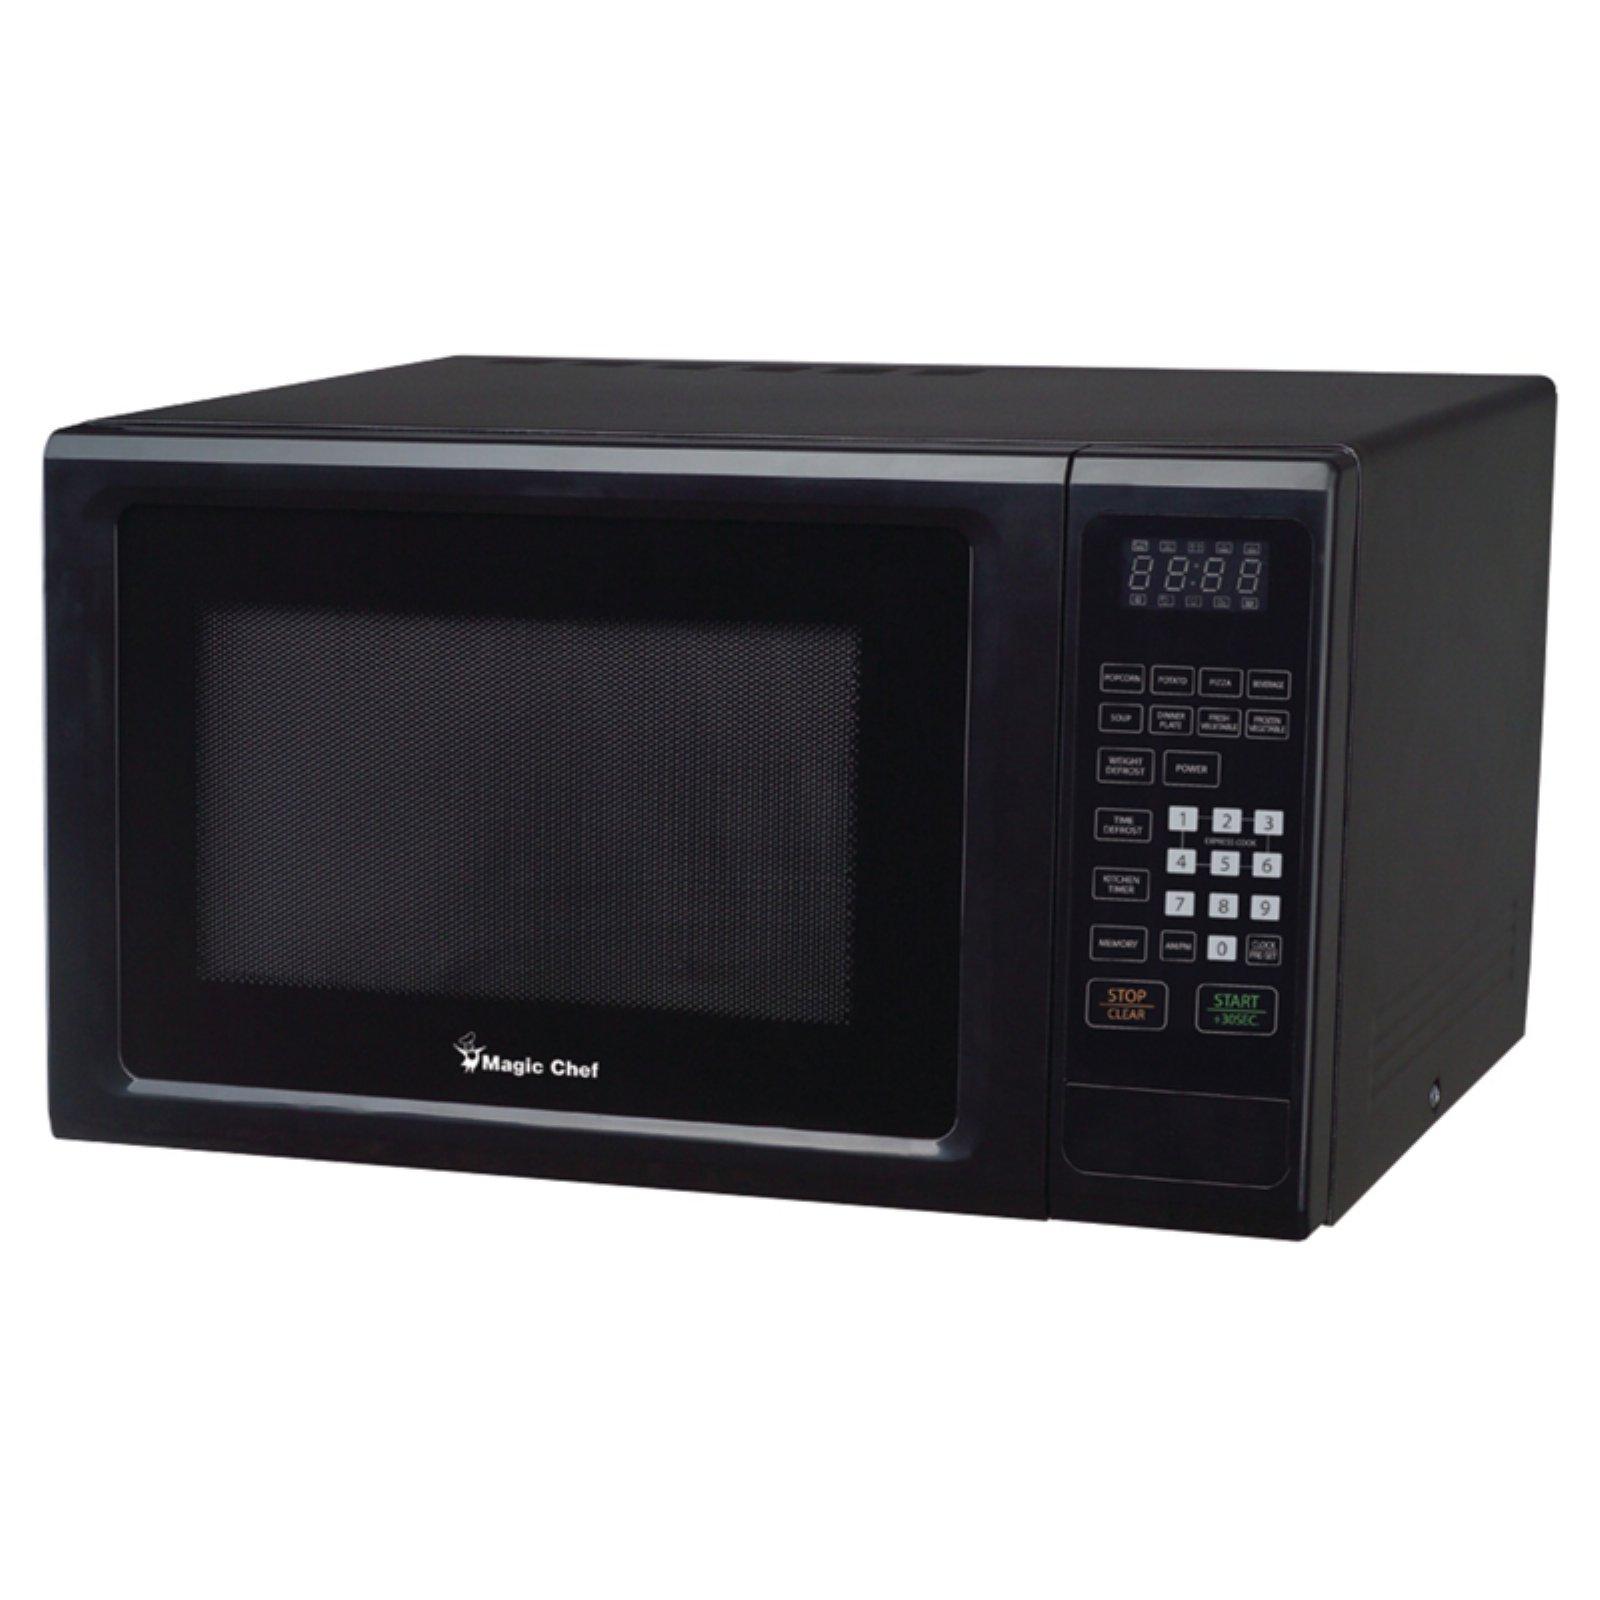 Magic Chef 1 Cu Ft 1000w Microwave